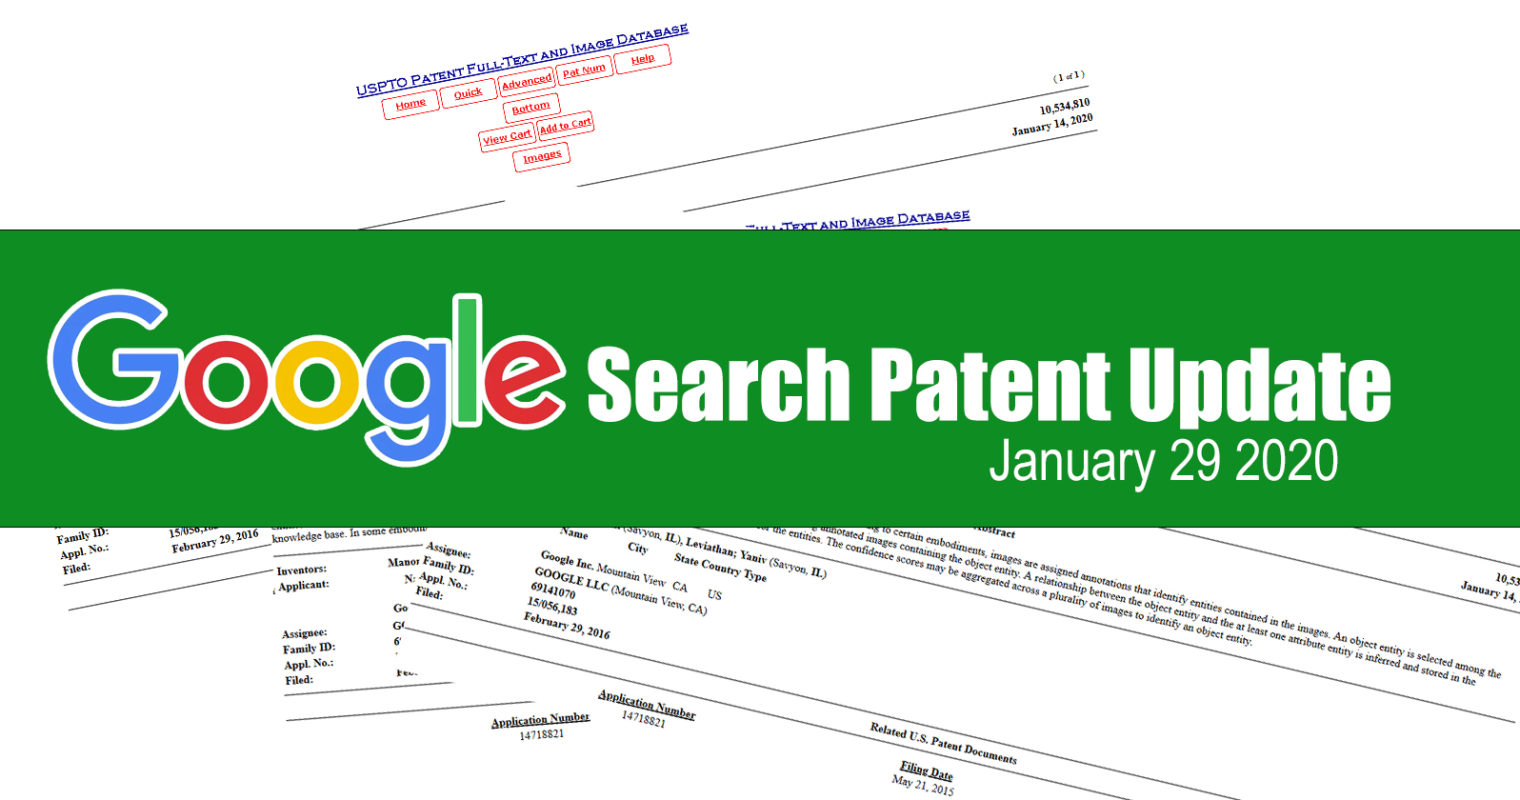 Google Search Patent Update – January 29, 2020